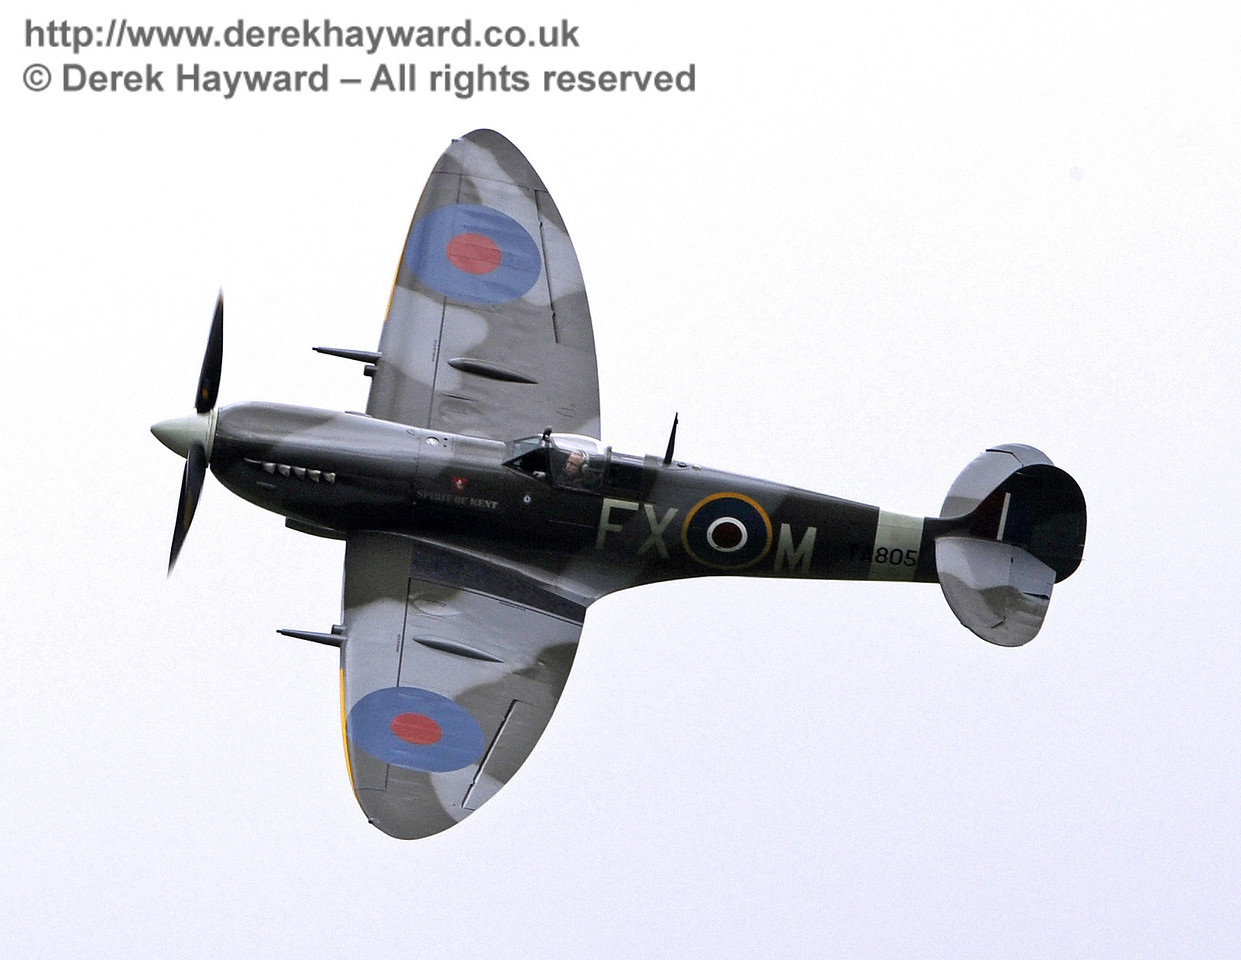 1944-built Spitfire HF MkIX, TA 80.  Southern at War, Horsted Keynes, 10.05.2014  9011